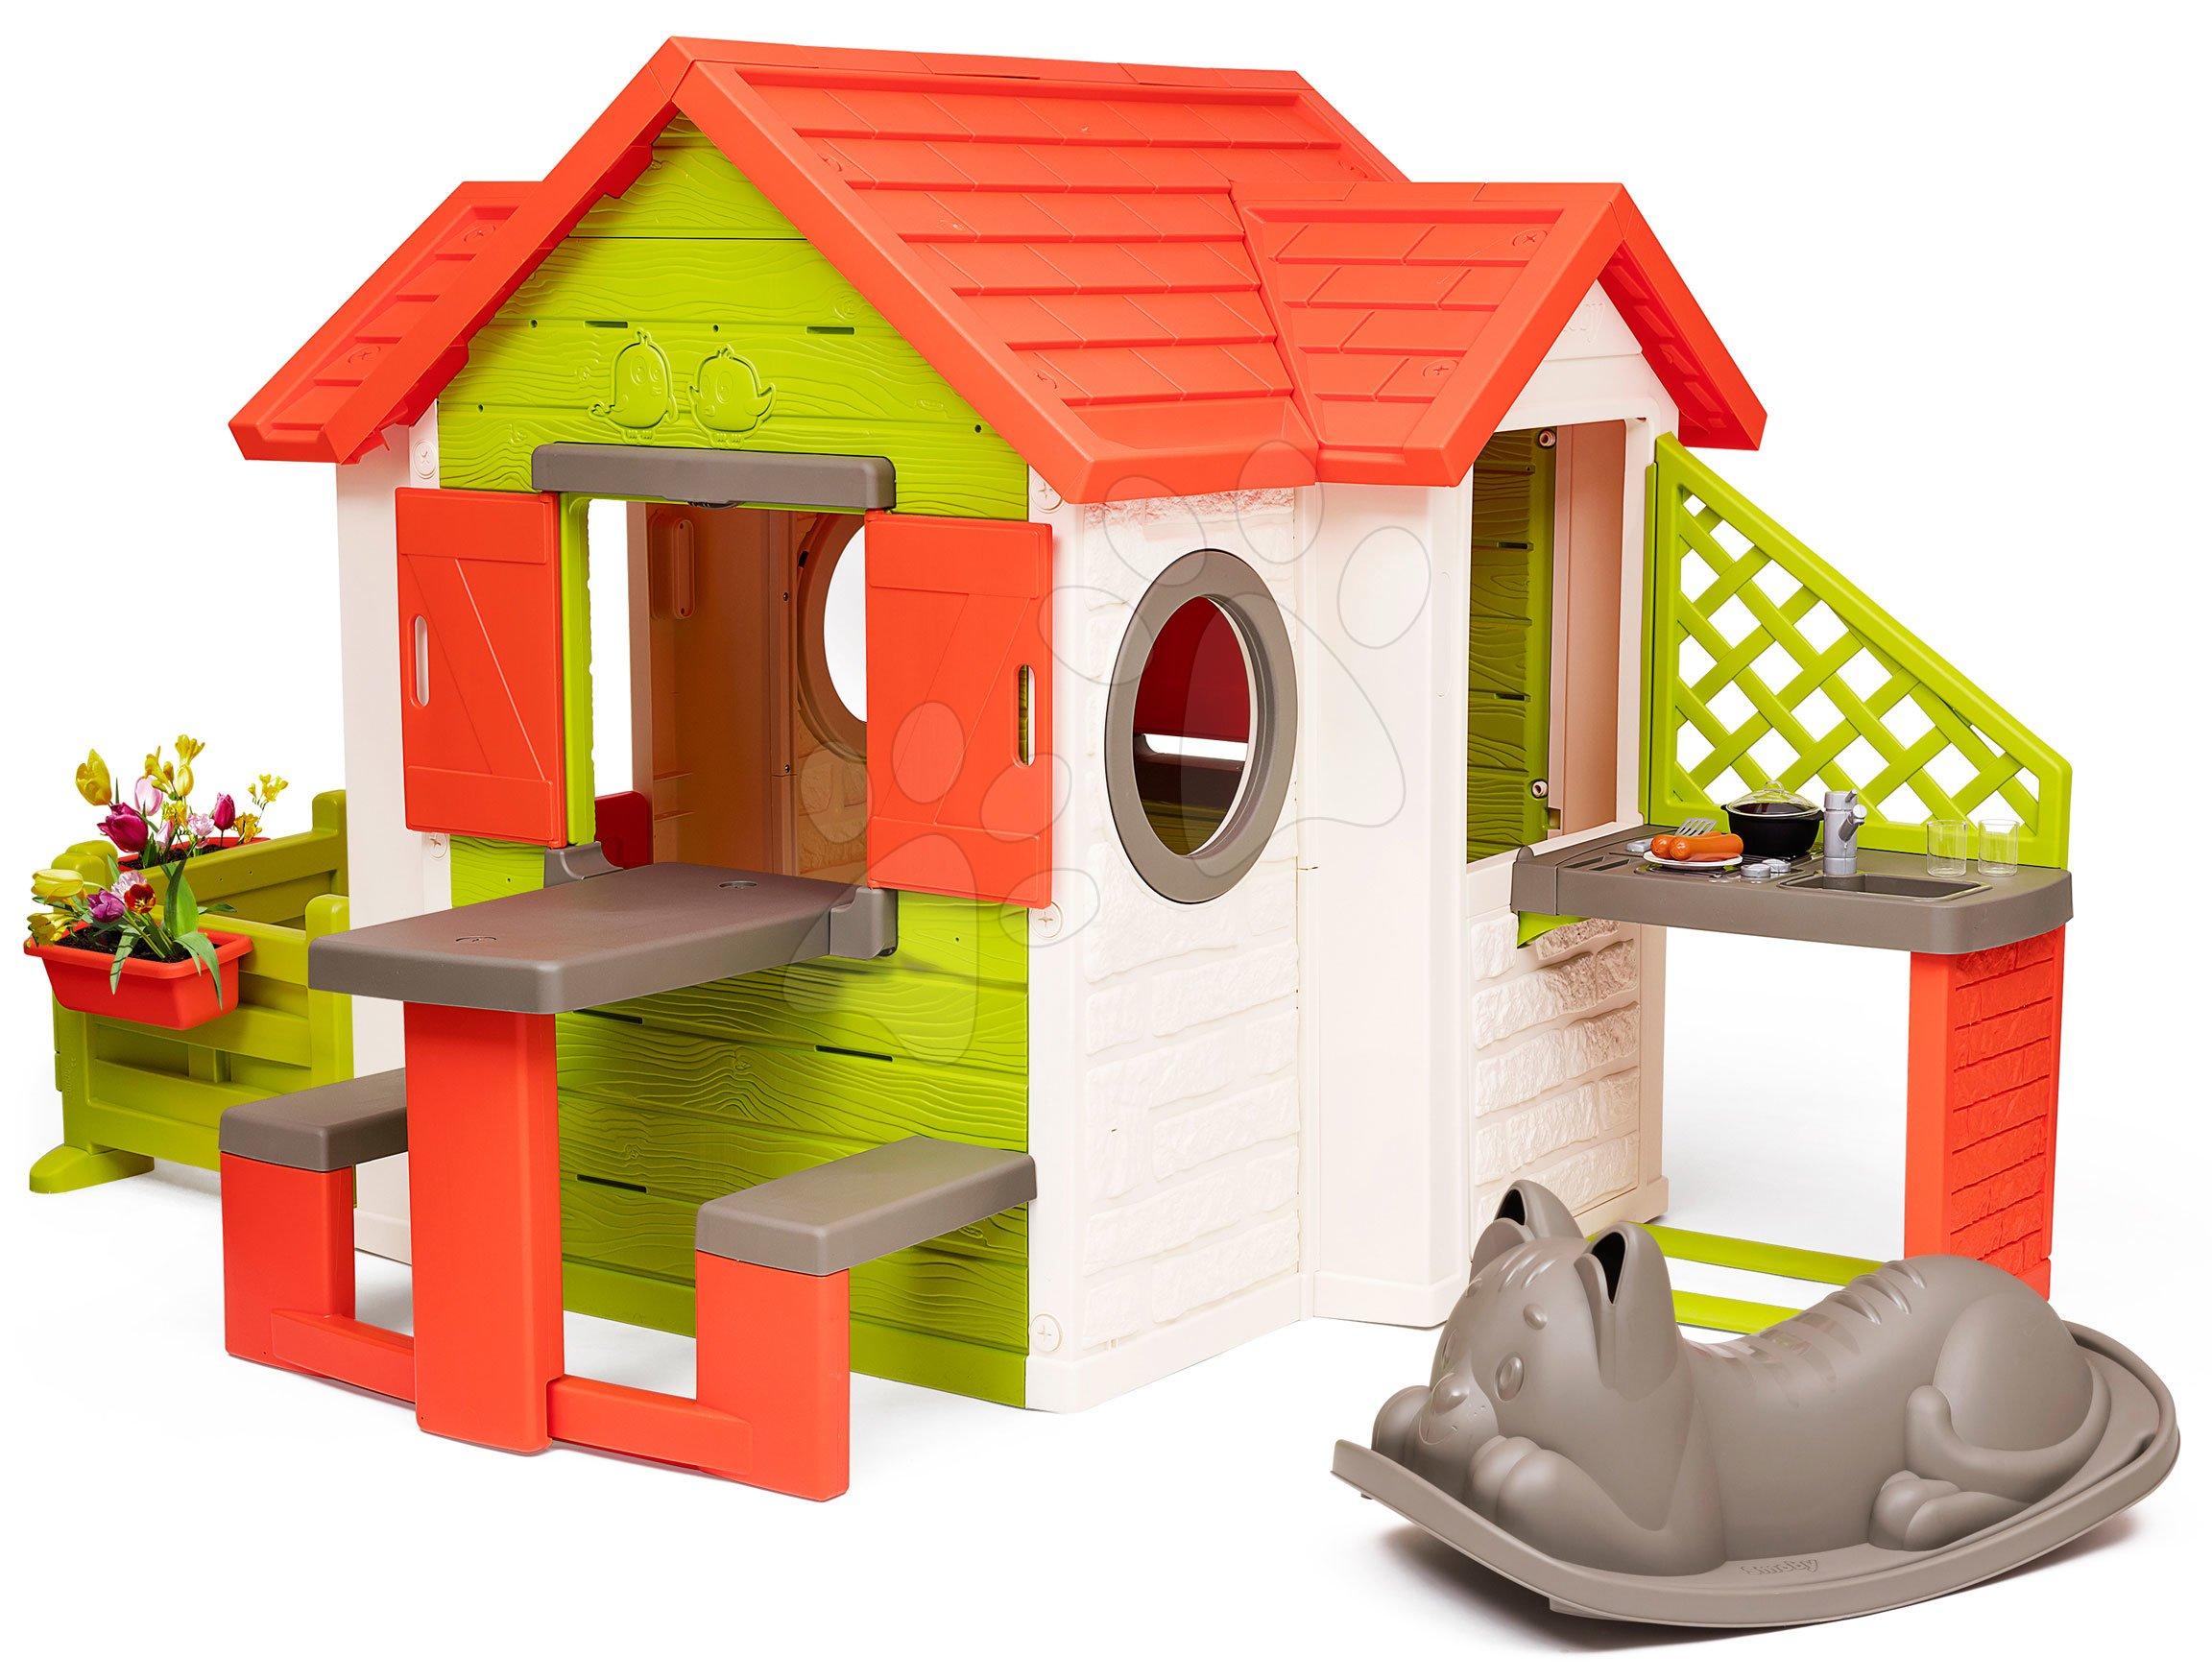 Domček My Neo House DeLuxe Smoby s nadstavbovým riešením a hojdačkou od 24 mes